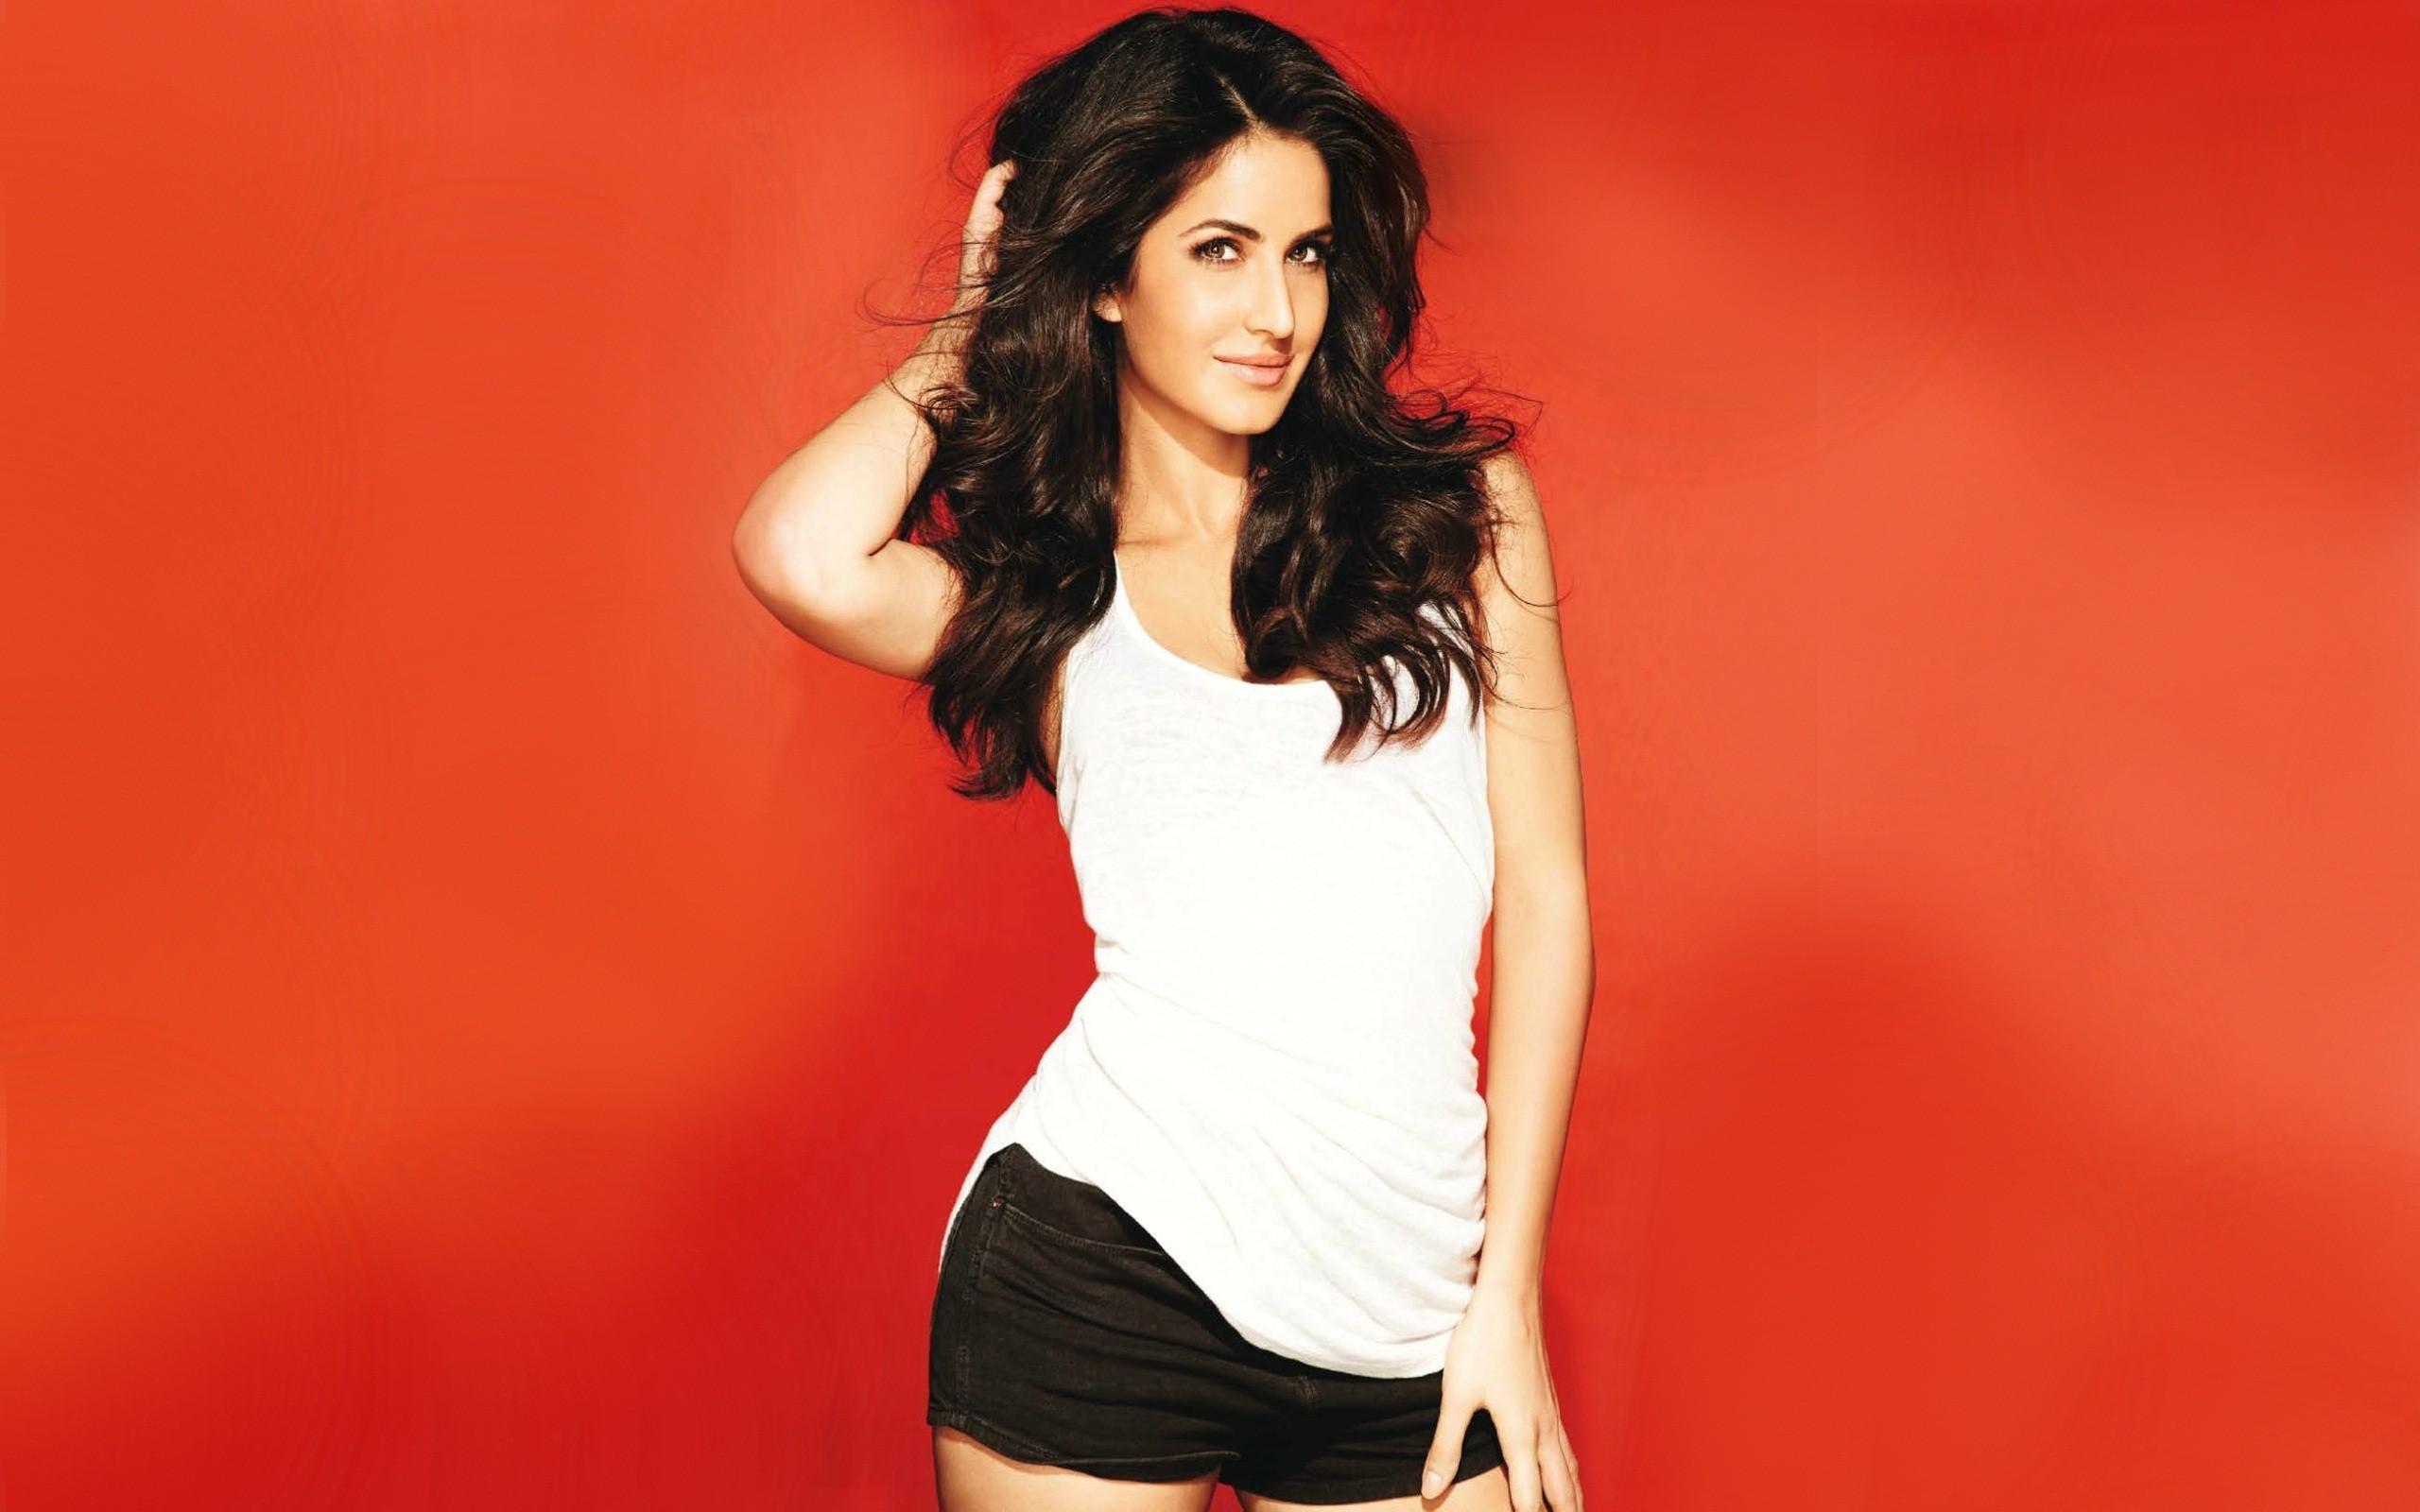 Bollywood Hungama Wallpapers Celebrities - WallpaperSafari